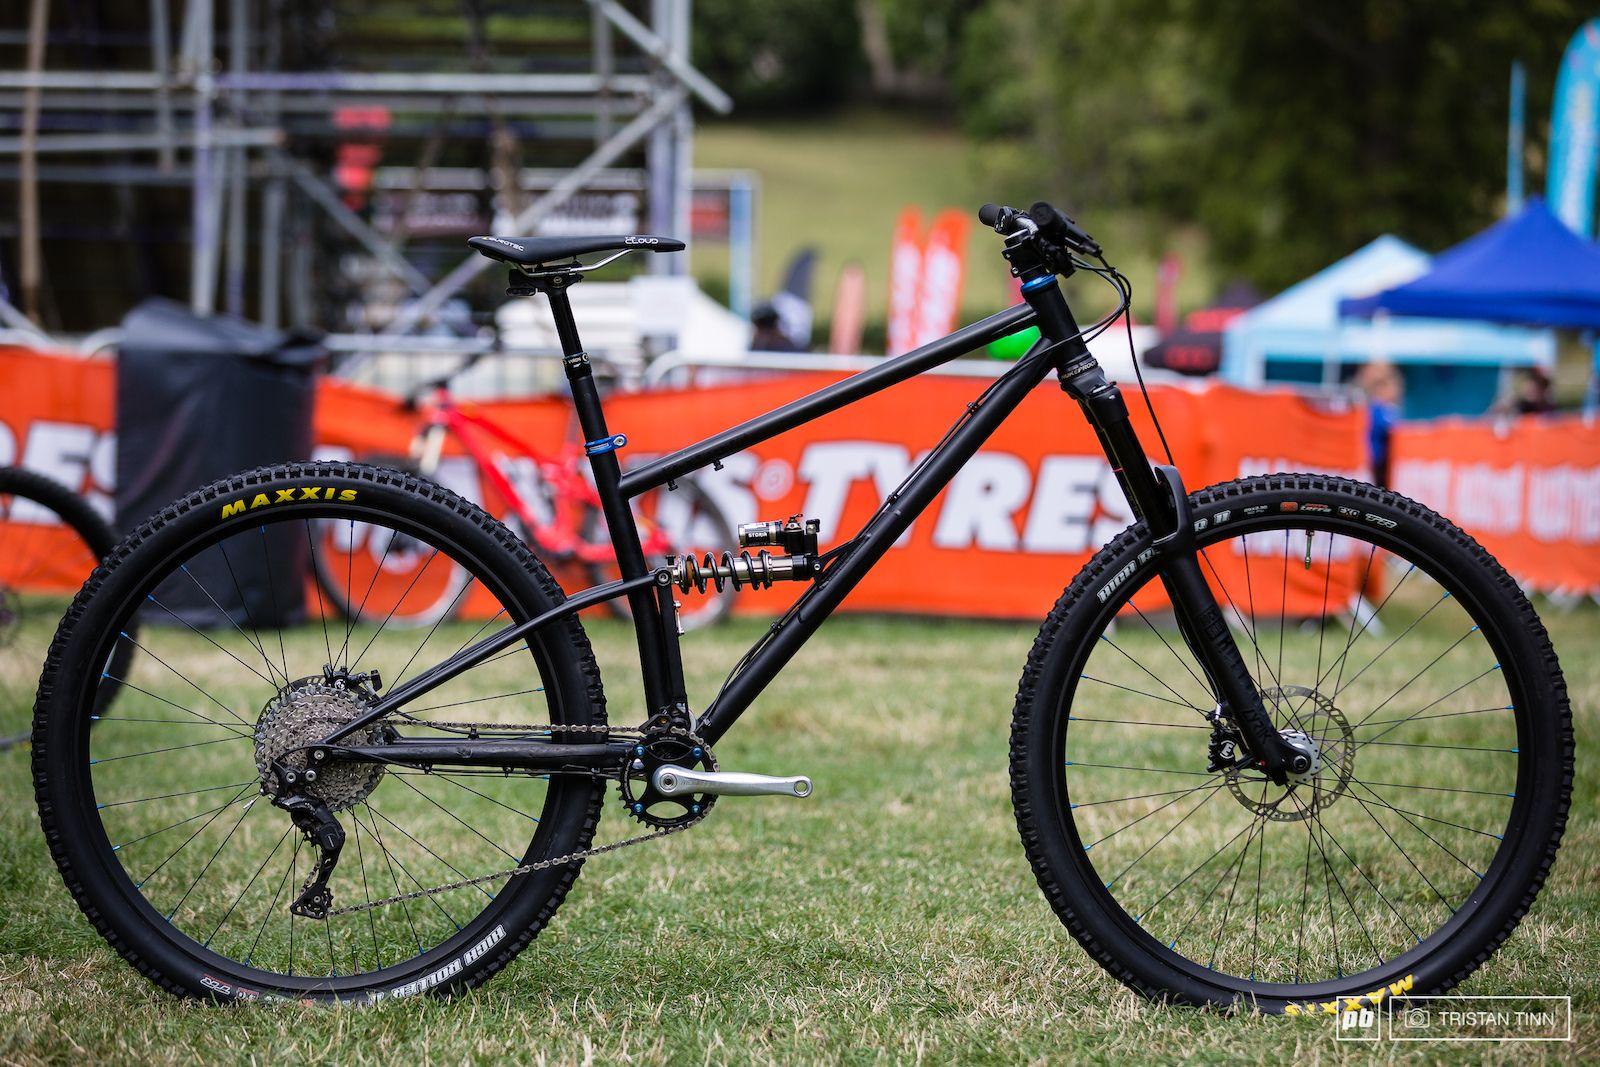 10 Enduro Bikes Ard Rock Festival 2018 Bike Rock Festivals